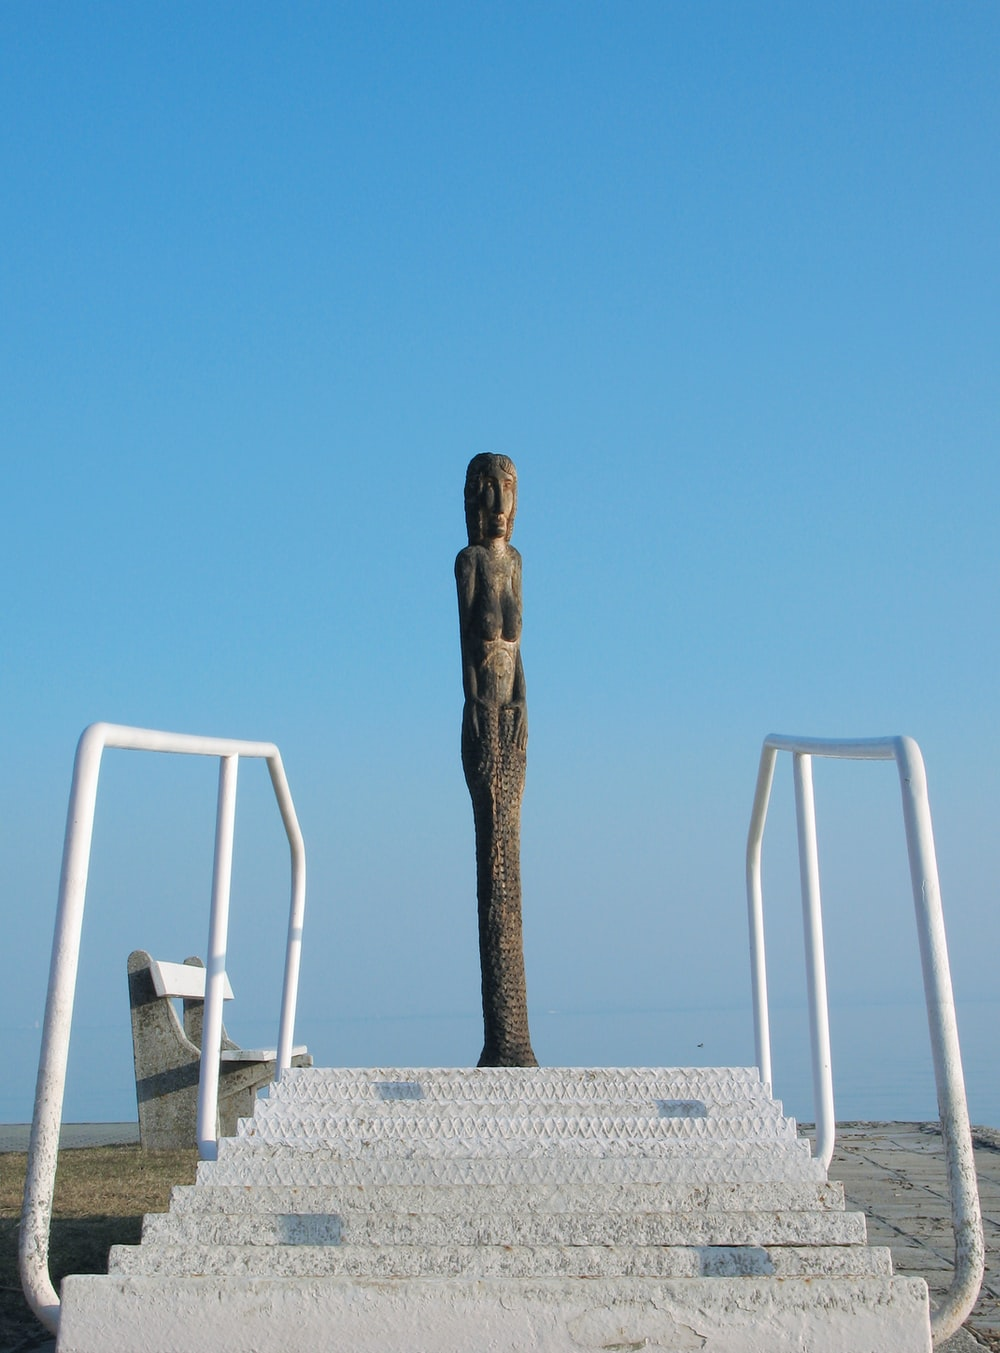 white wooden chair near statue under blue sky during daytime